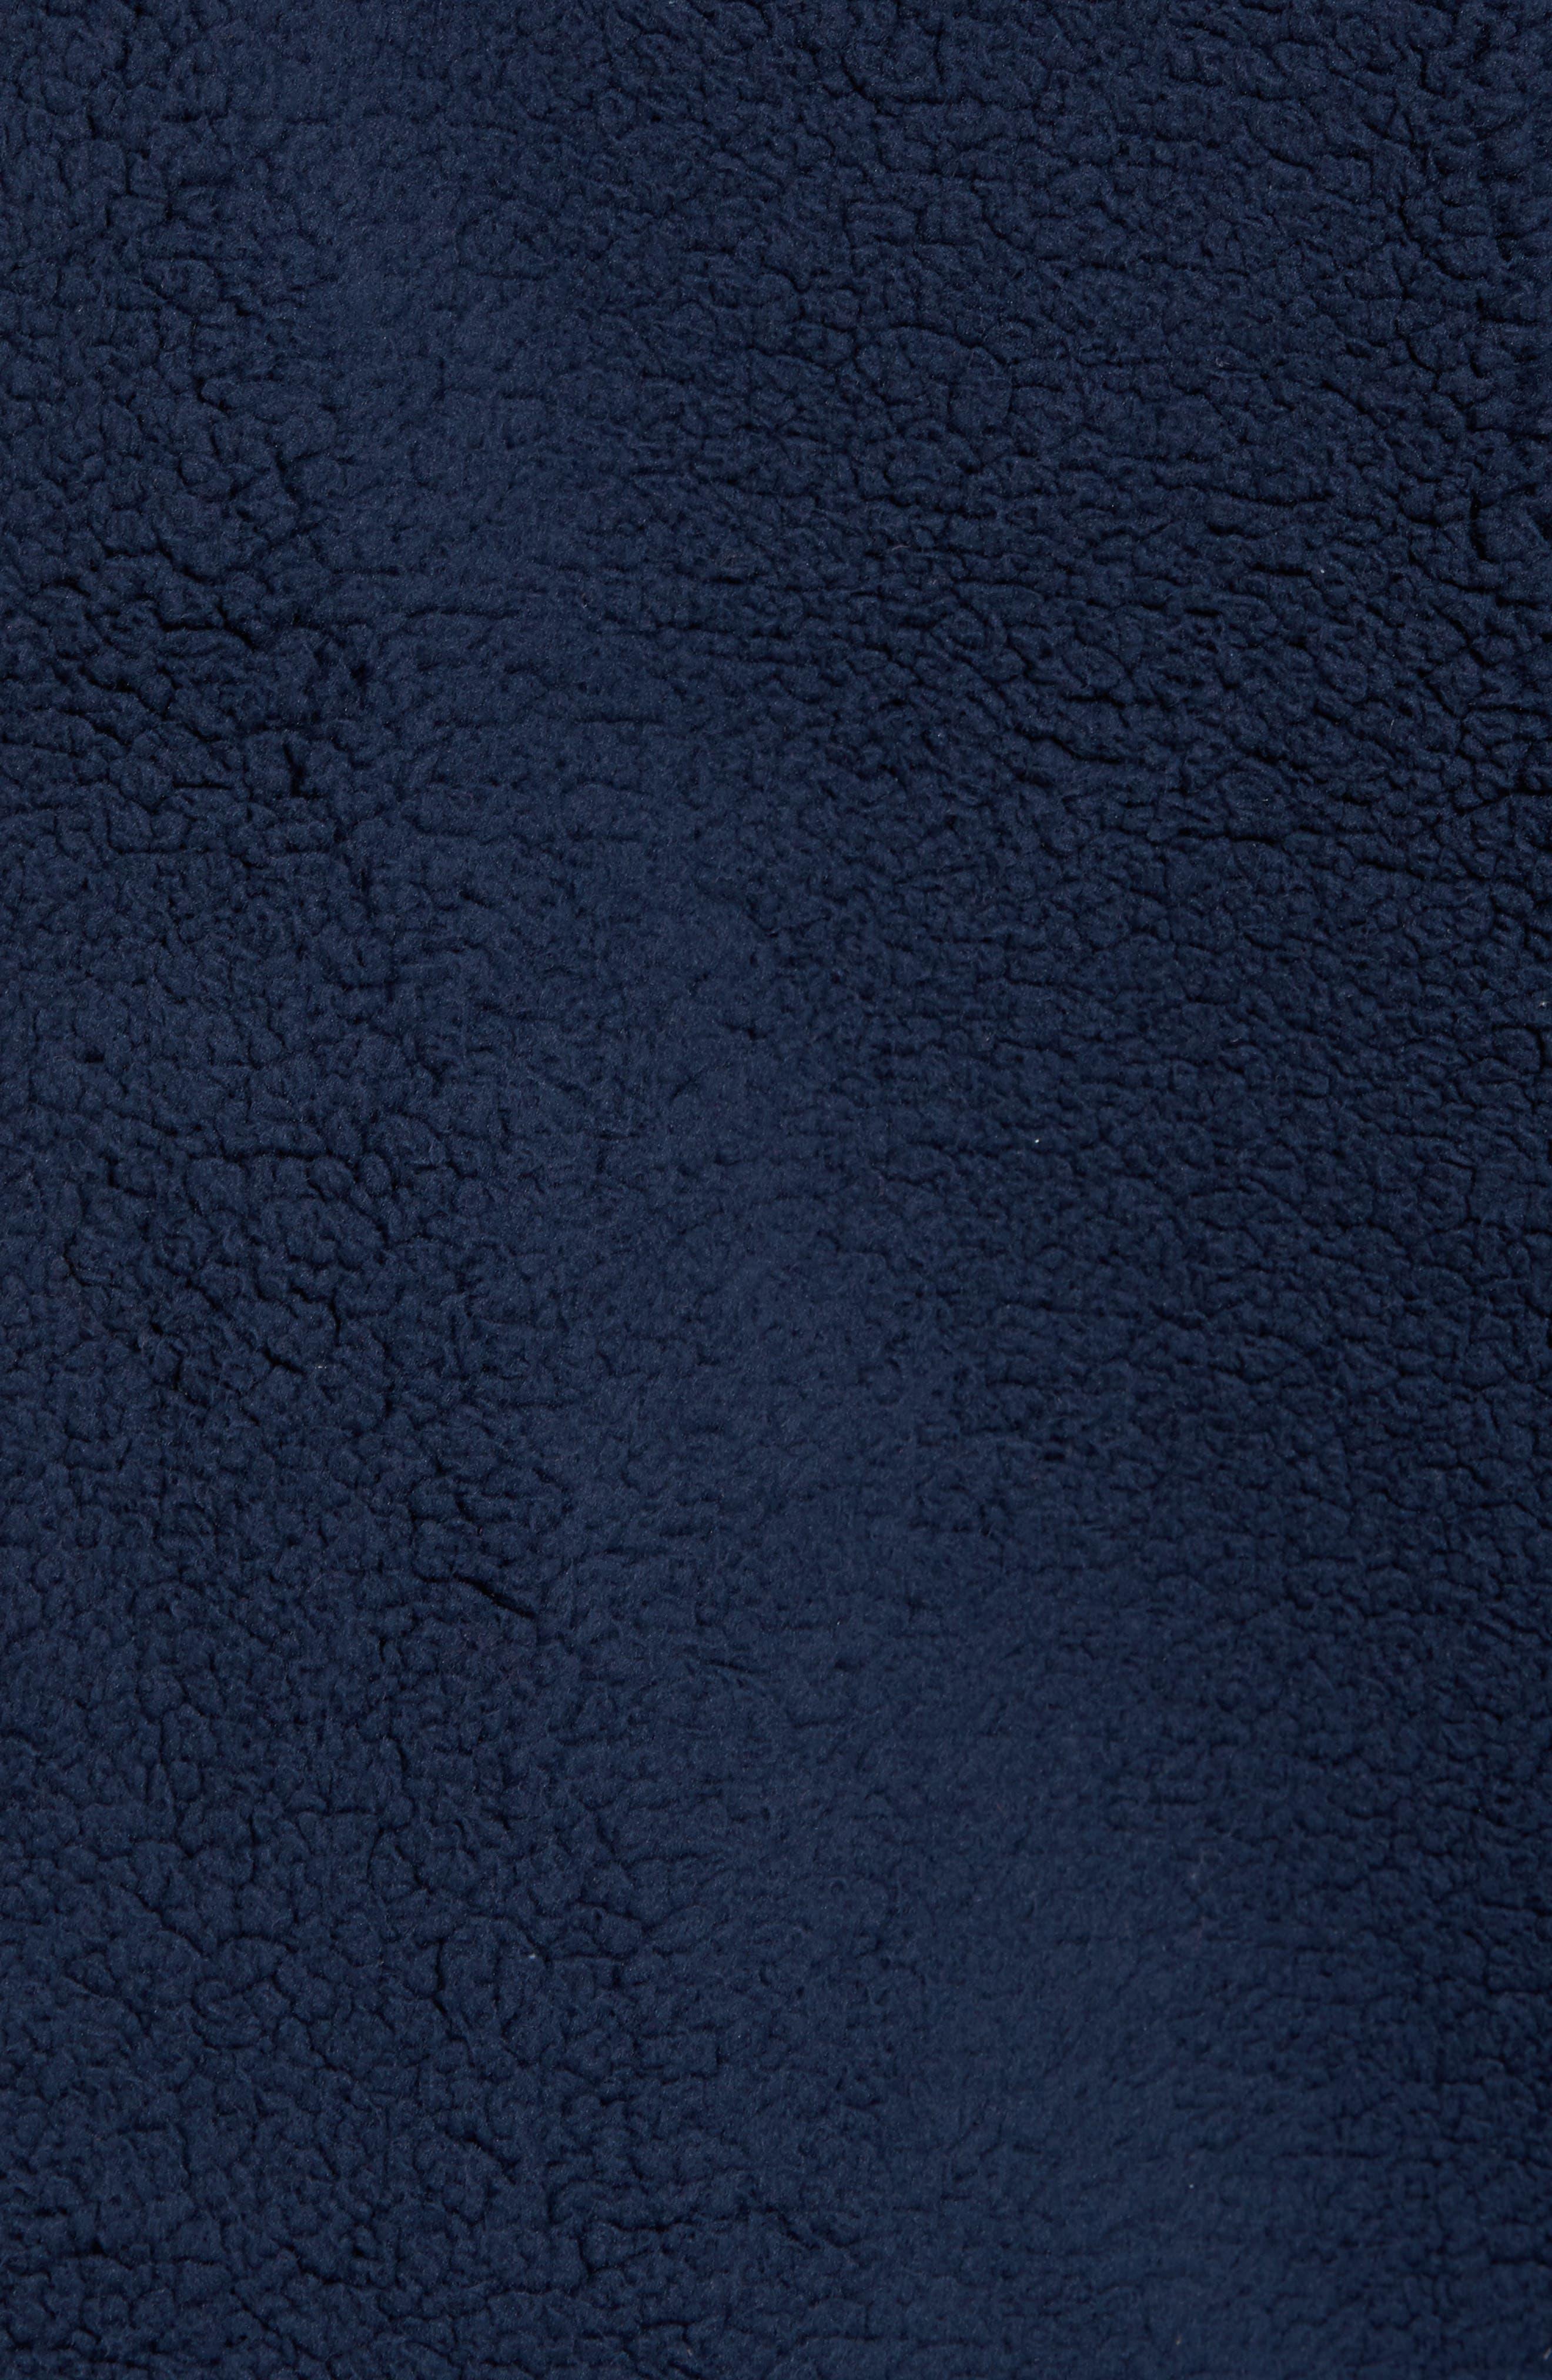 Sportswear Harborside Heavyweight Fleece Vest,                             Alternate thumbnail 18, color,